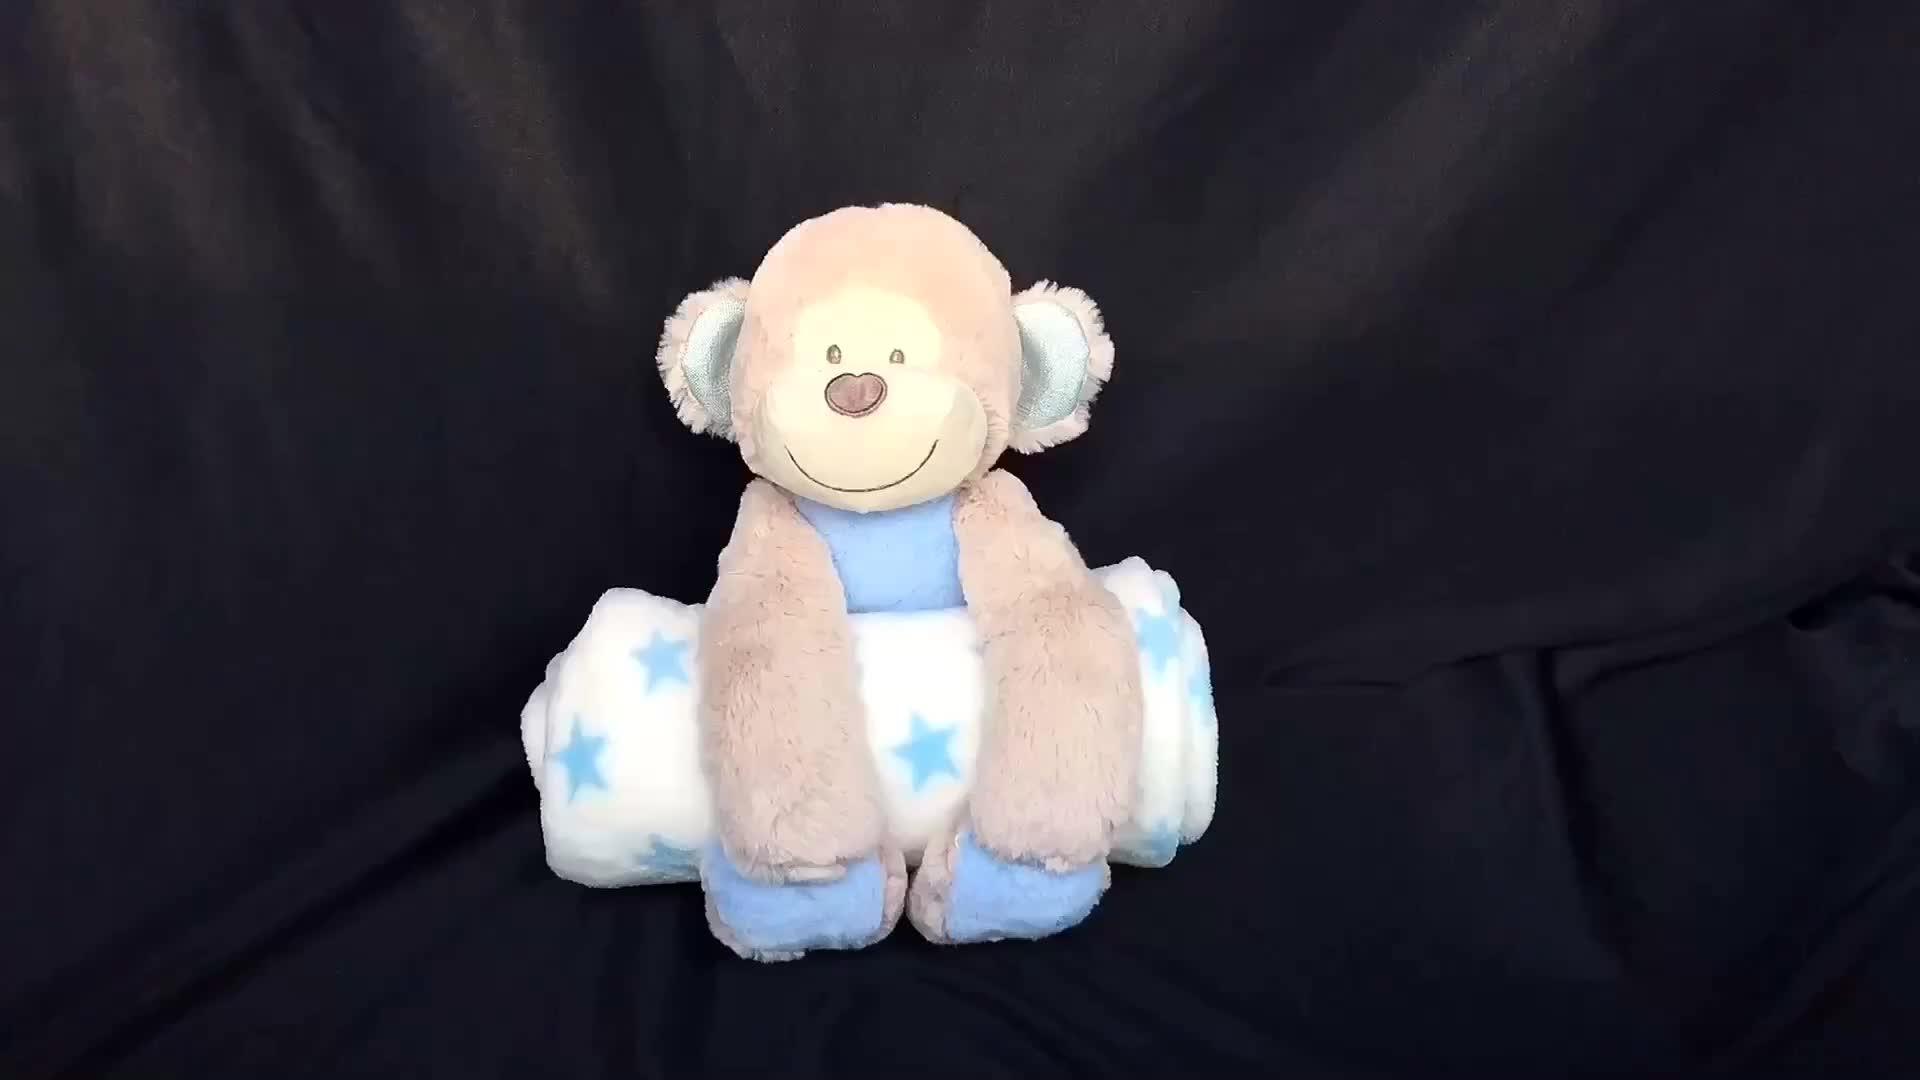 Infant baby stuffed animal toy set monkey plush toy with blanket